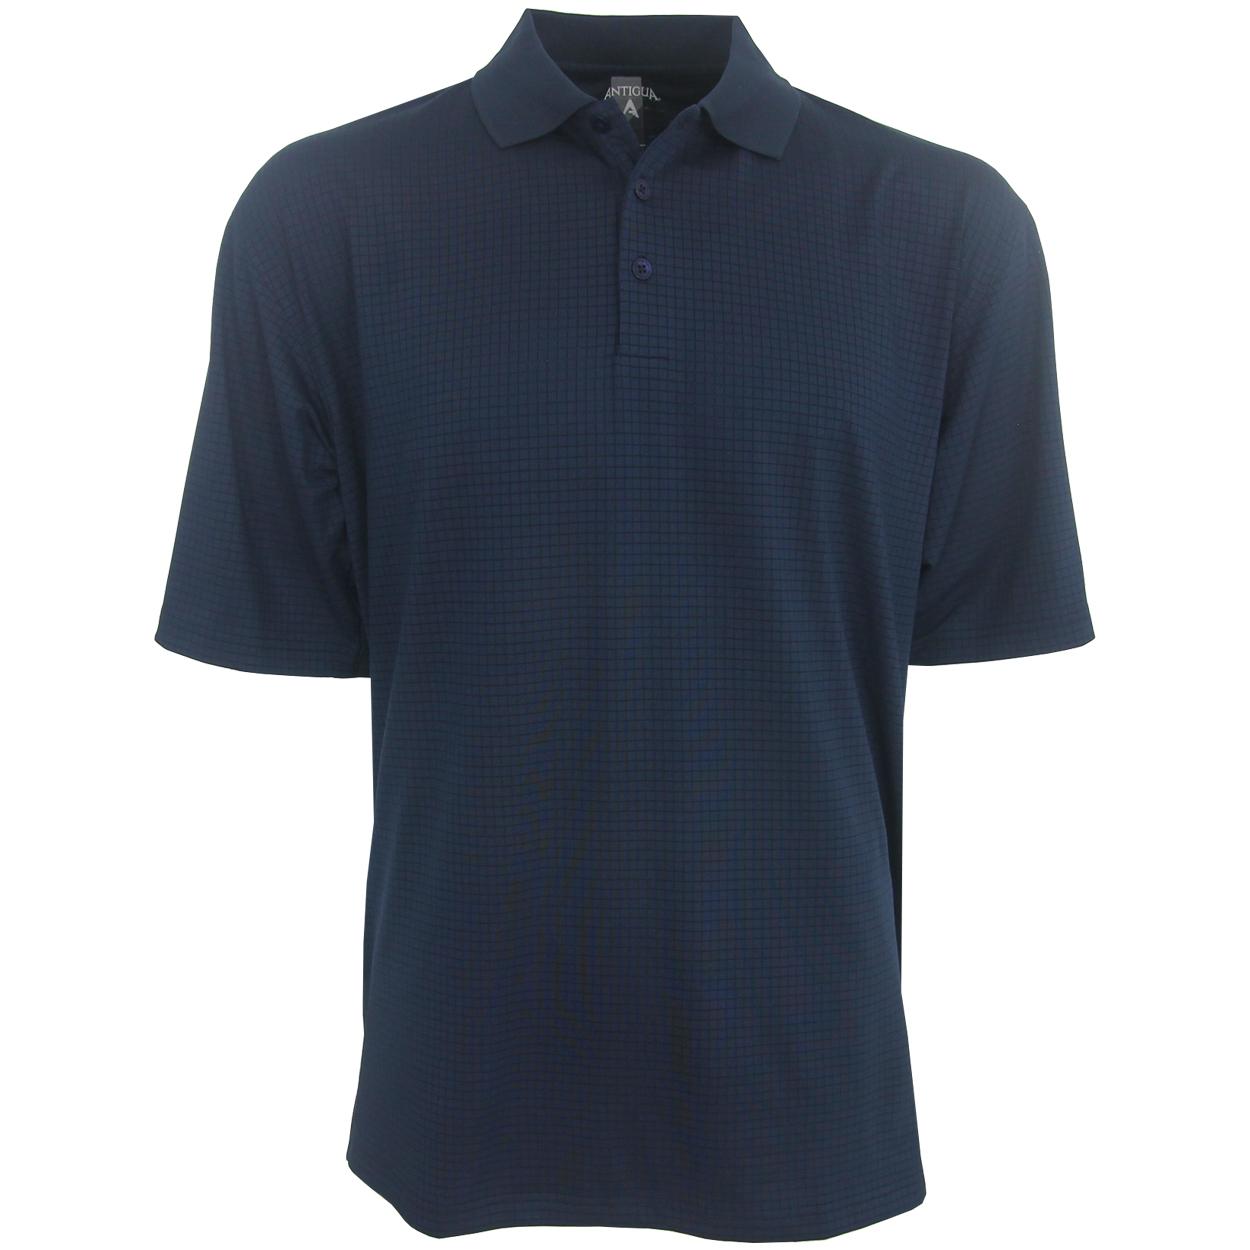 Antigua phoenix performance polo golf shirt for Polo golf performance shirt